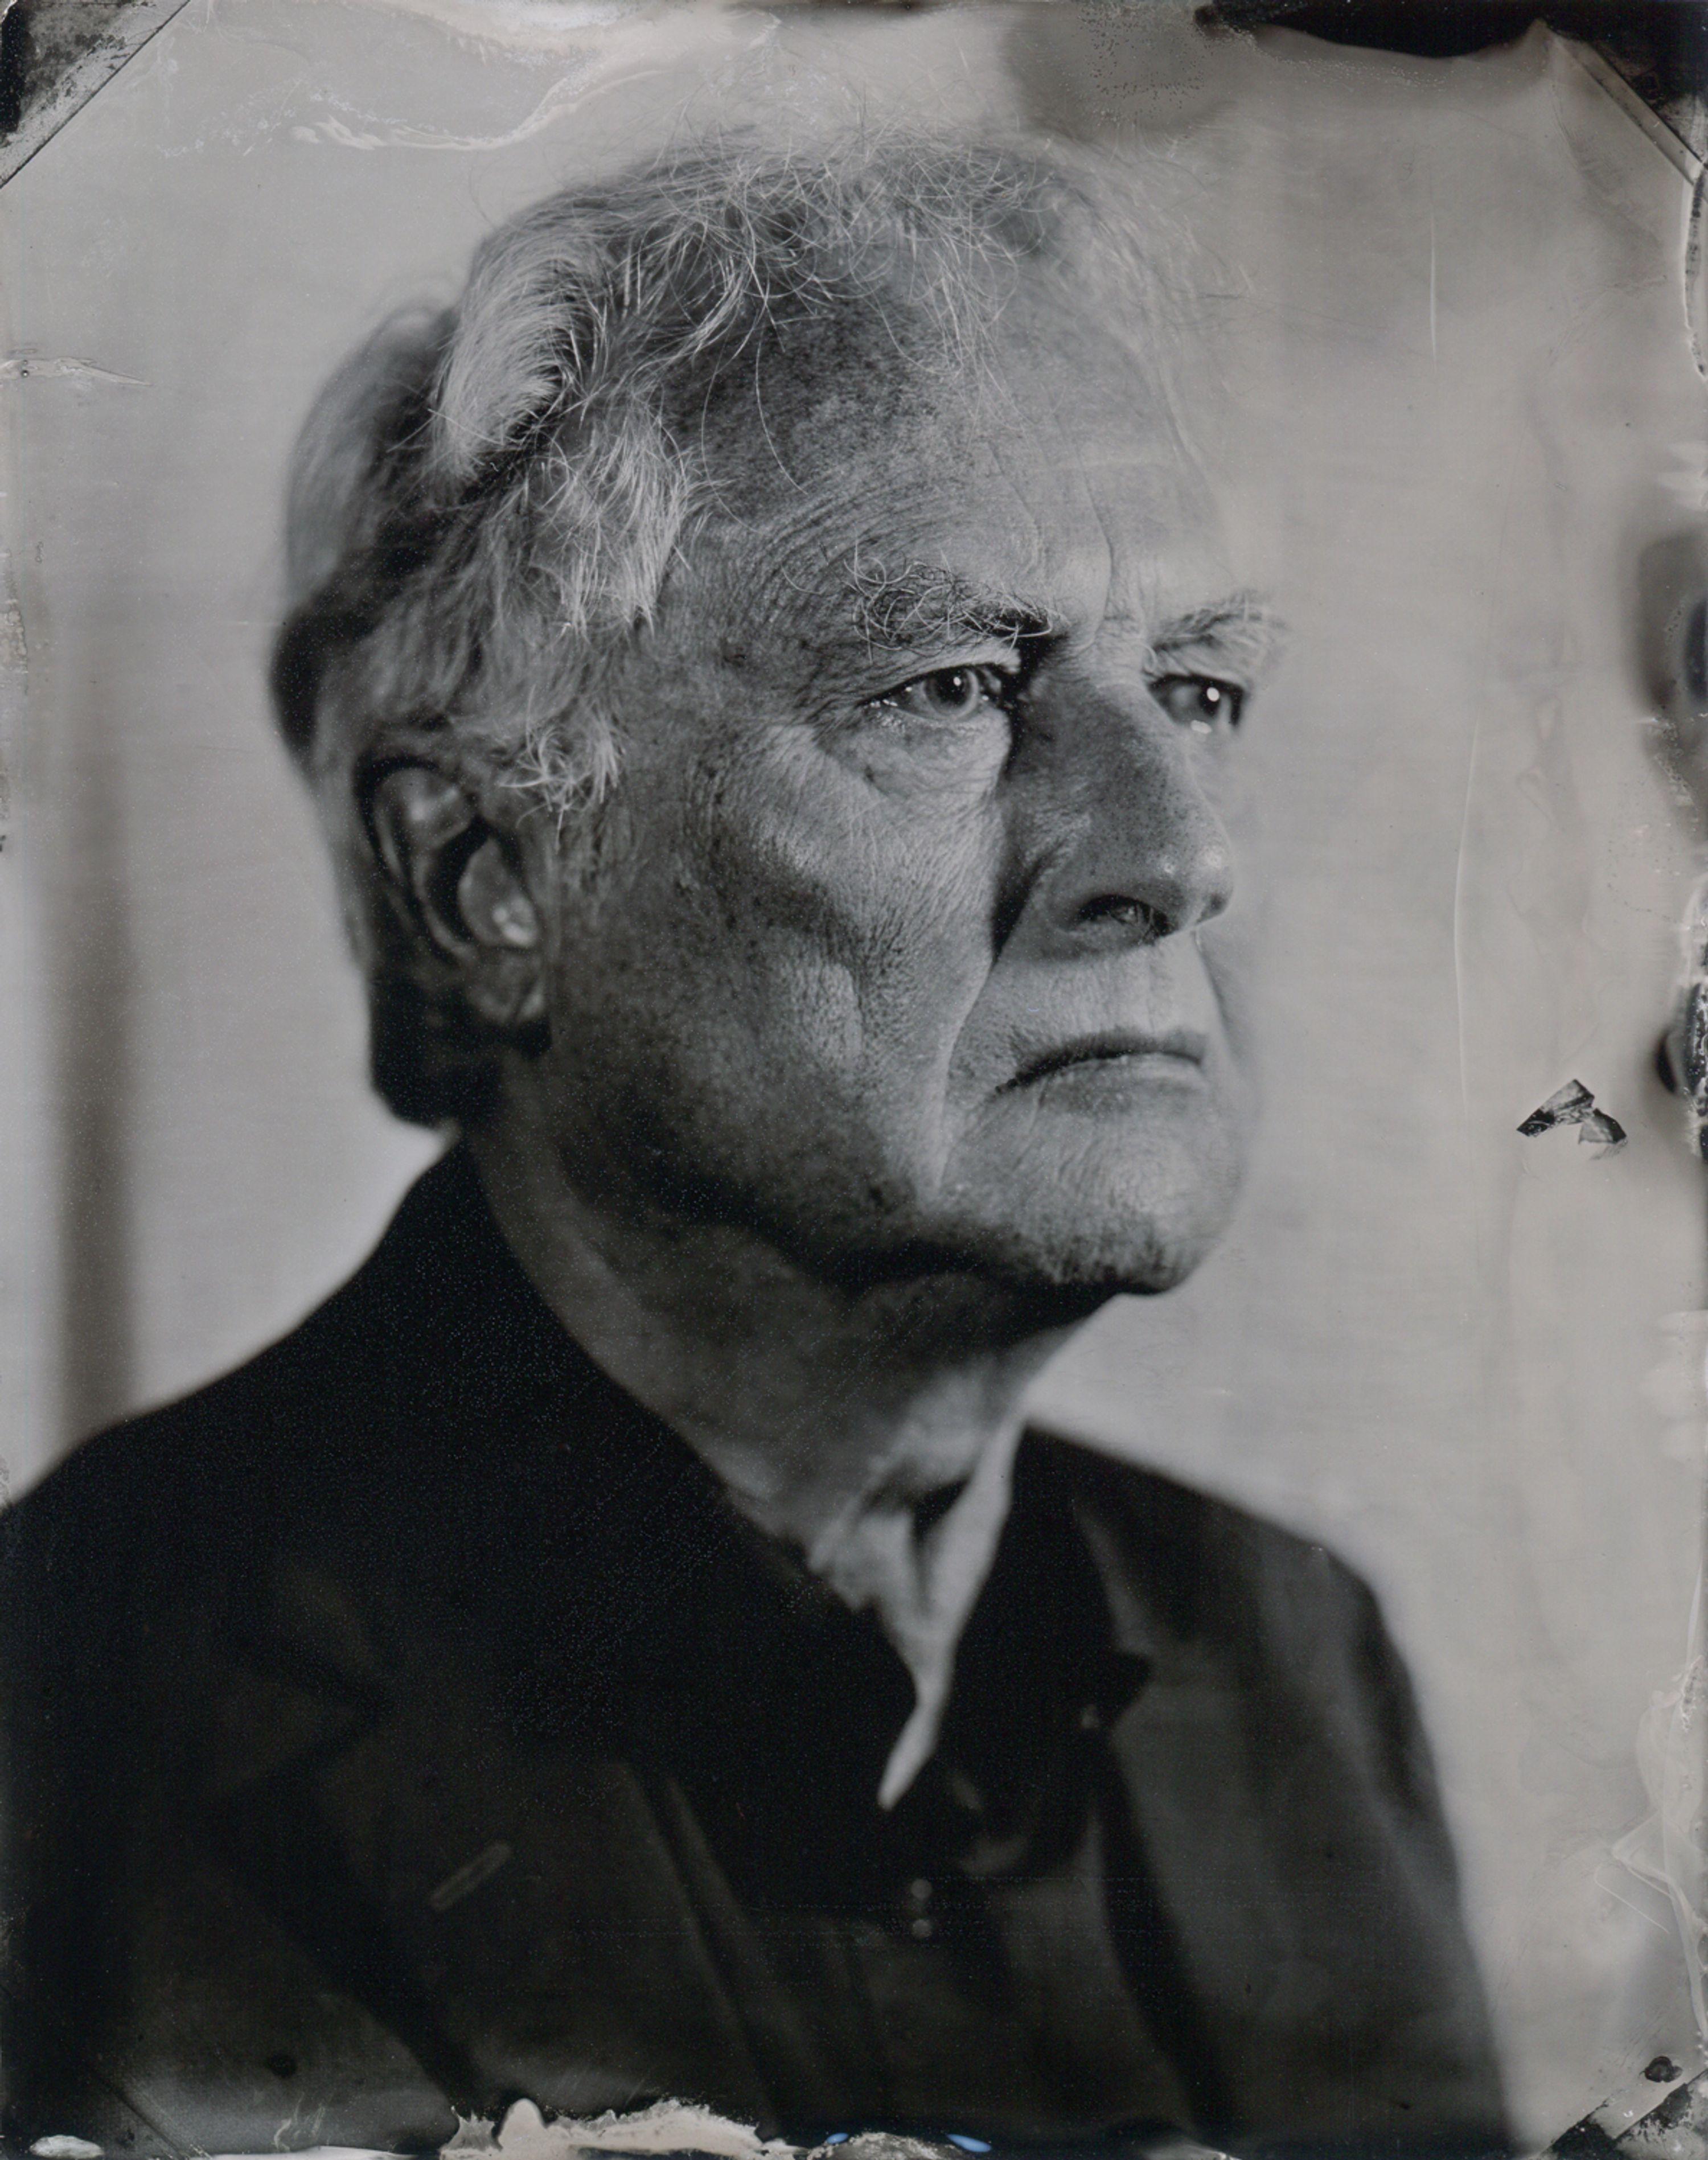 Portrait of Richard Dawkins printed on a piece of tin